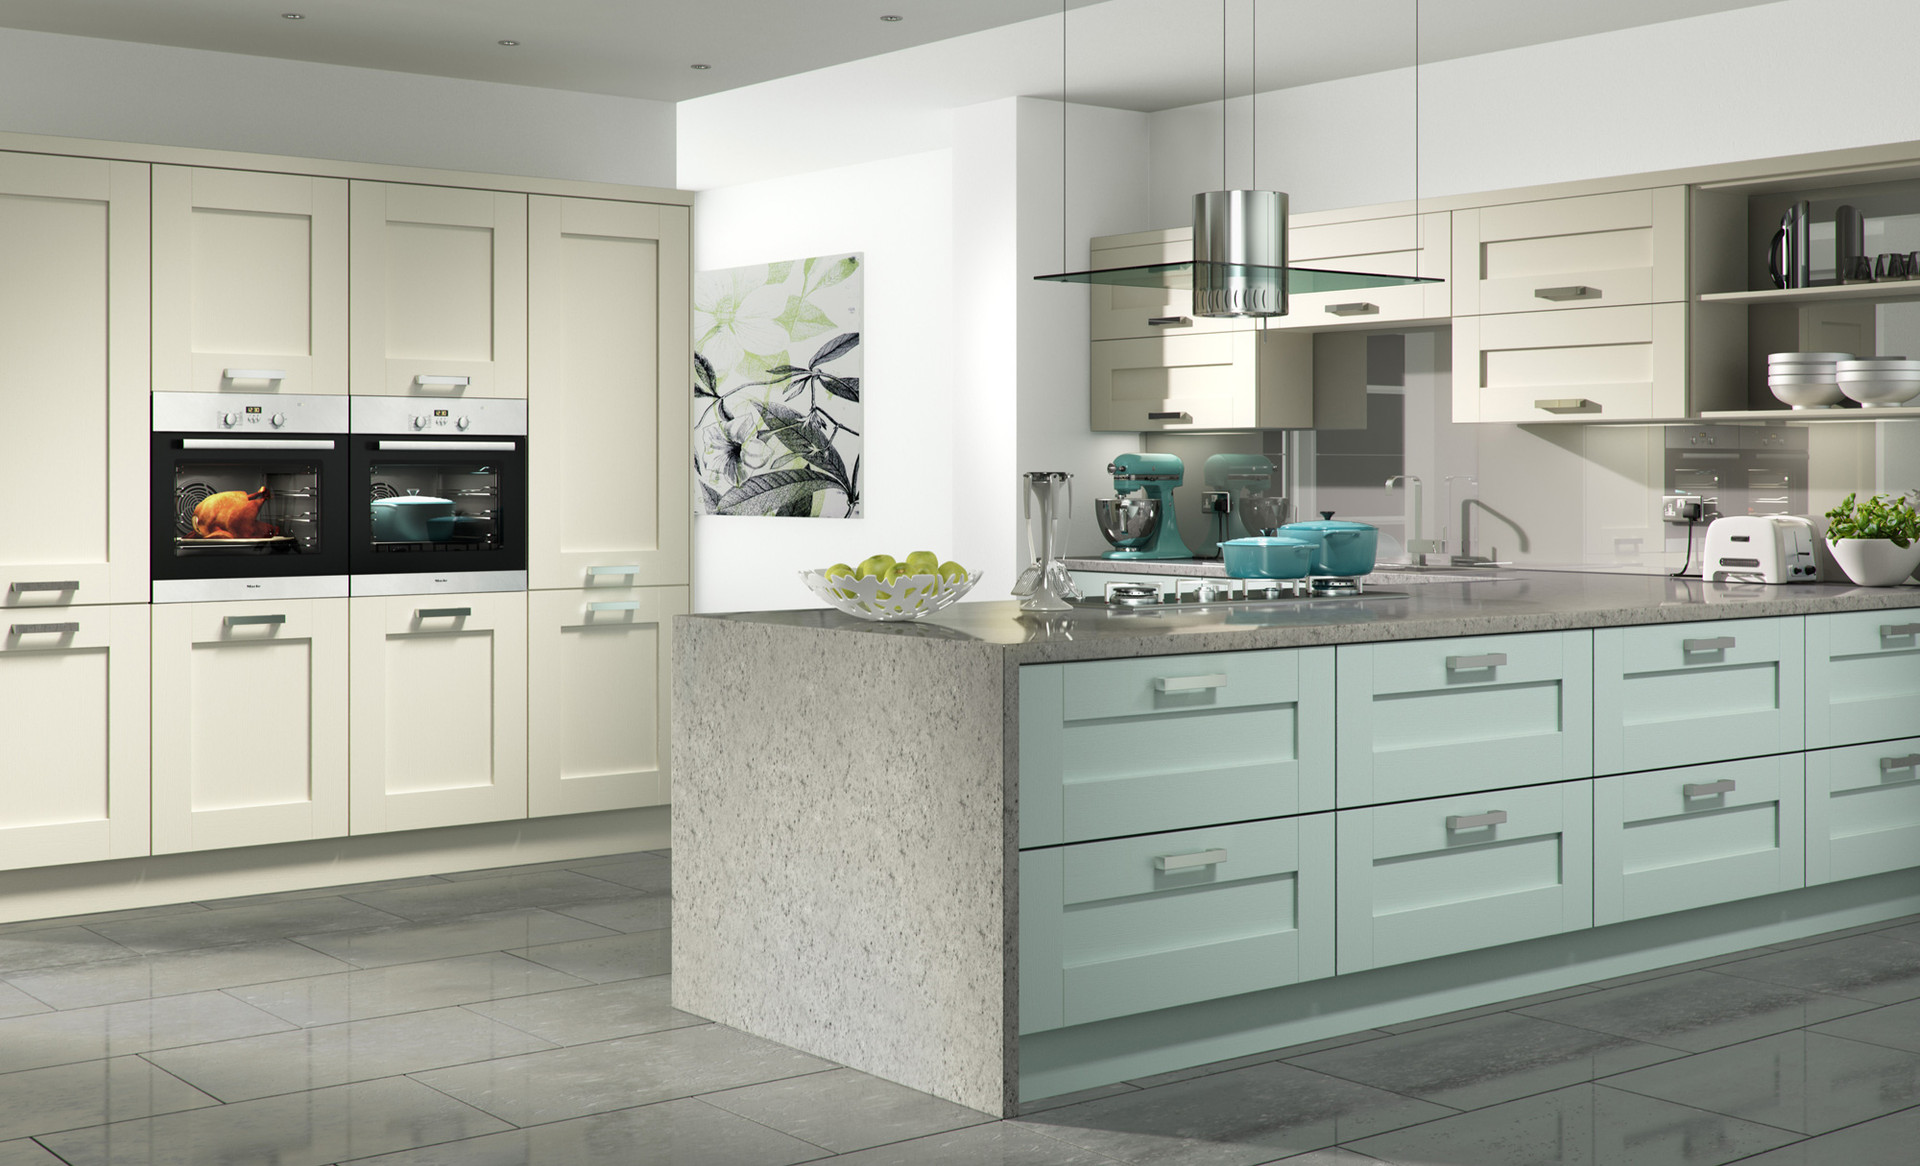 Windsor shaker Ivory and Light Blue kitchen